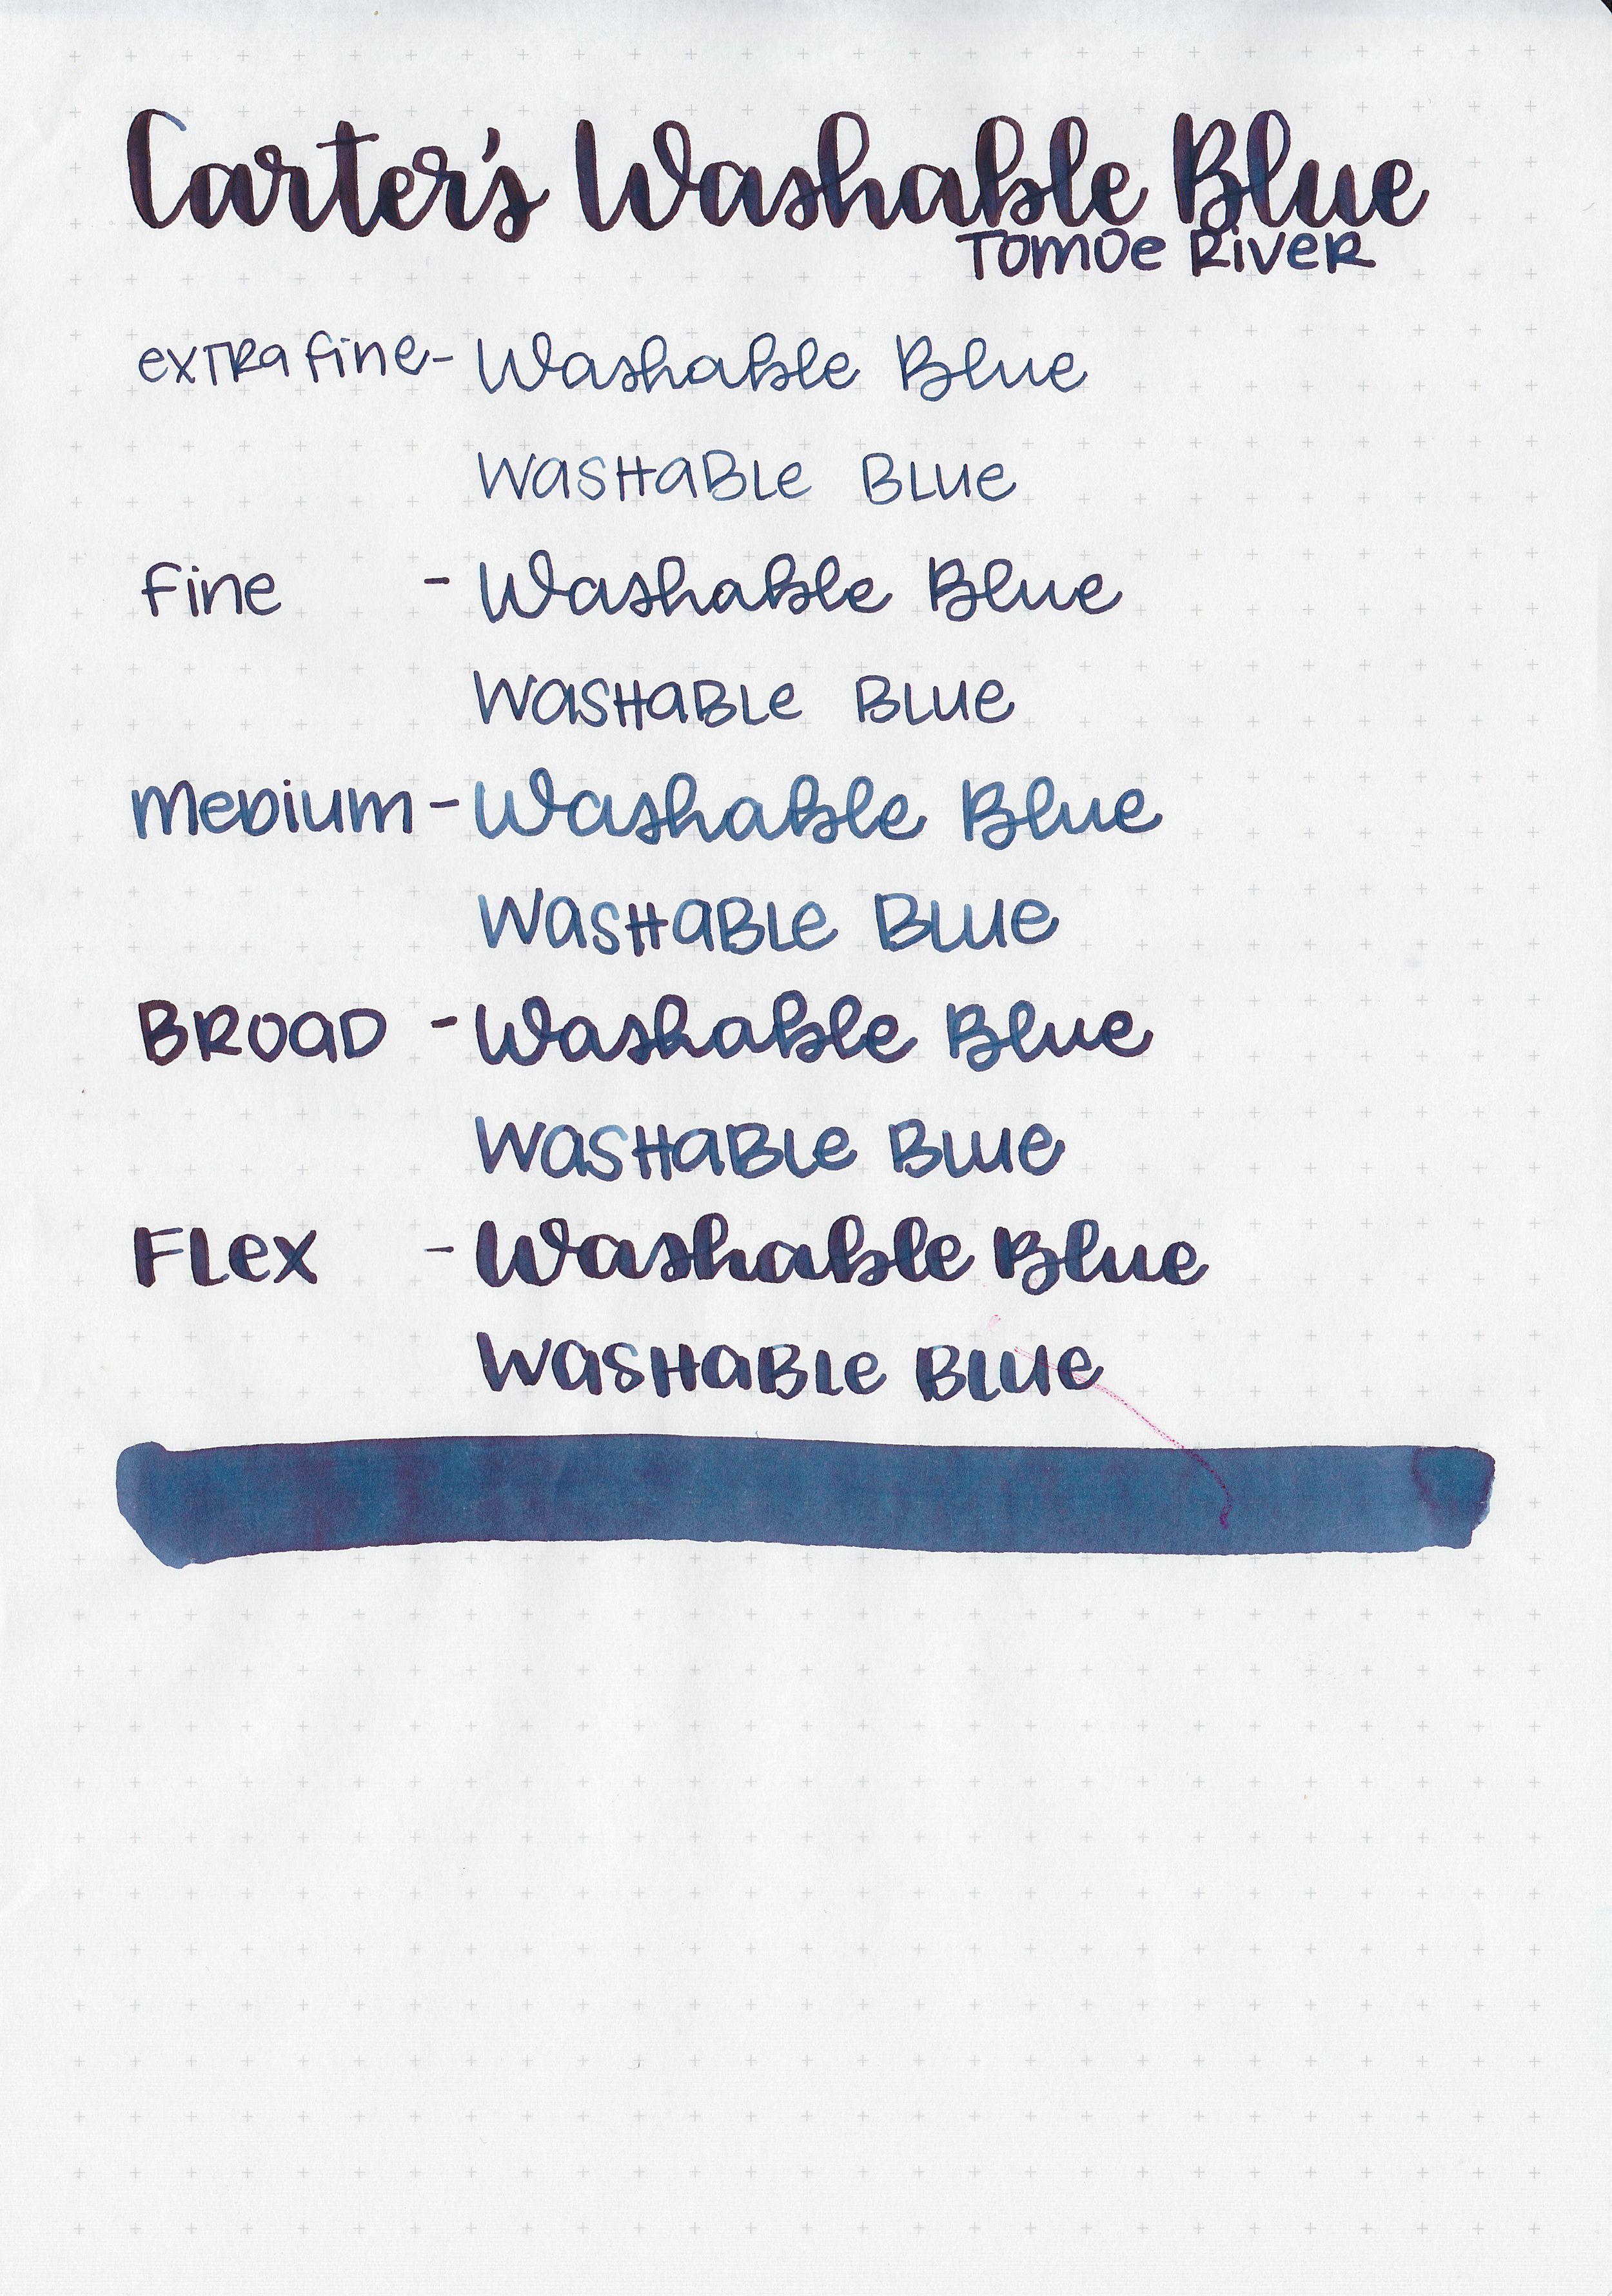 cart-washable-blue-6.jpg